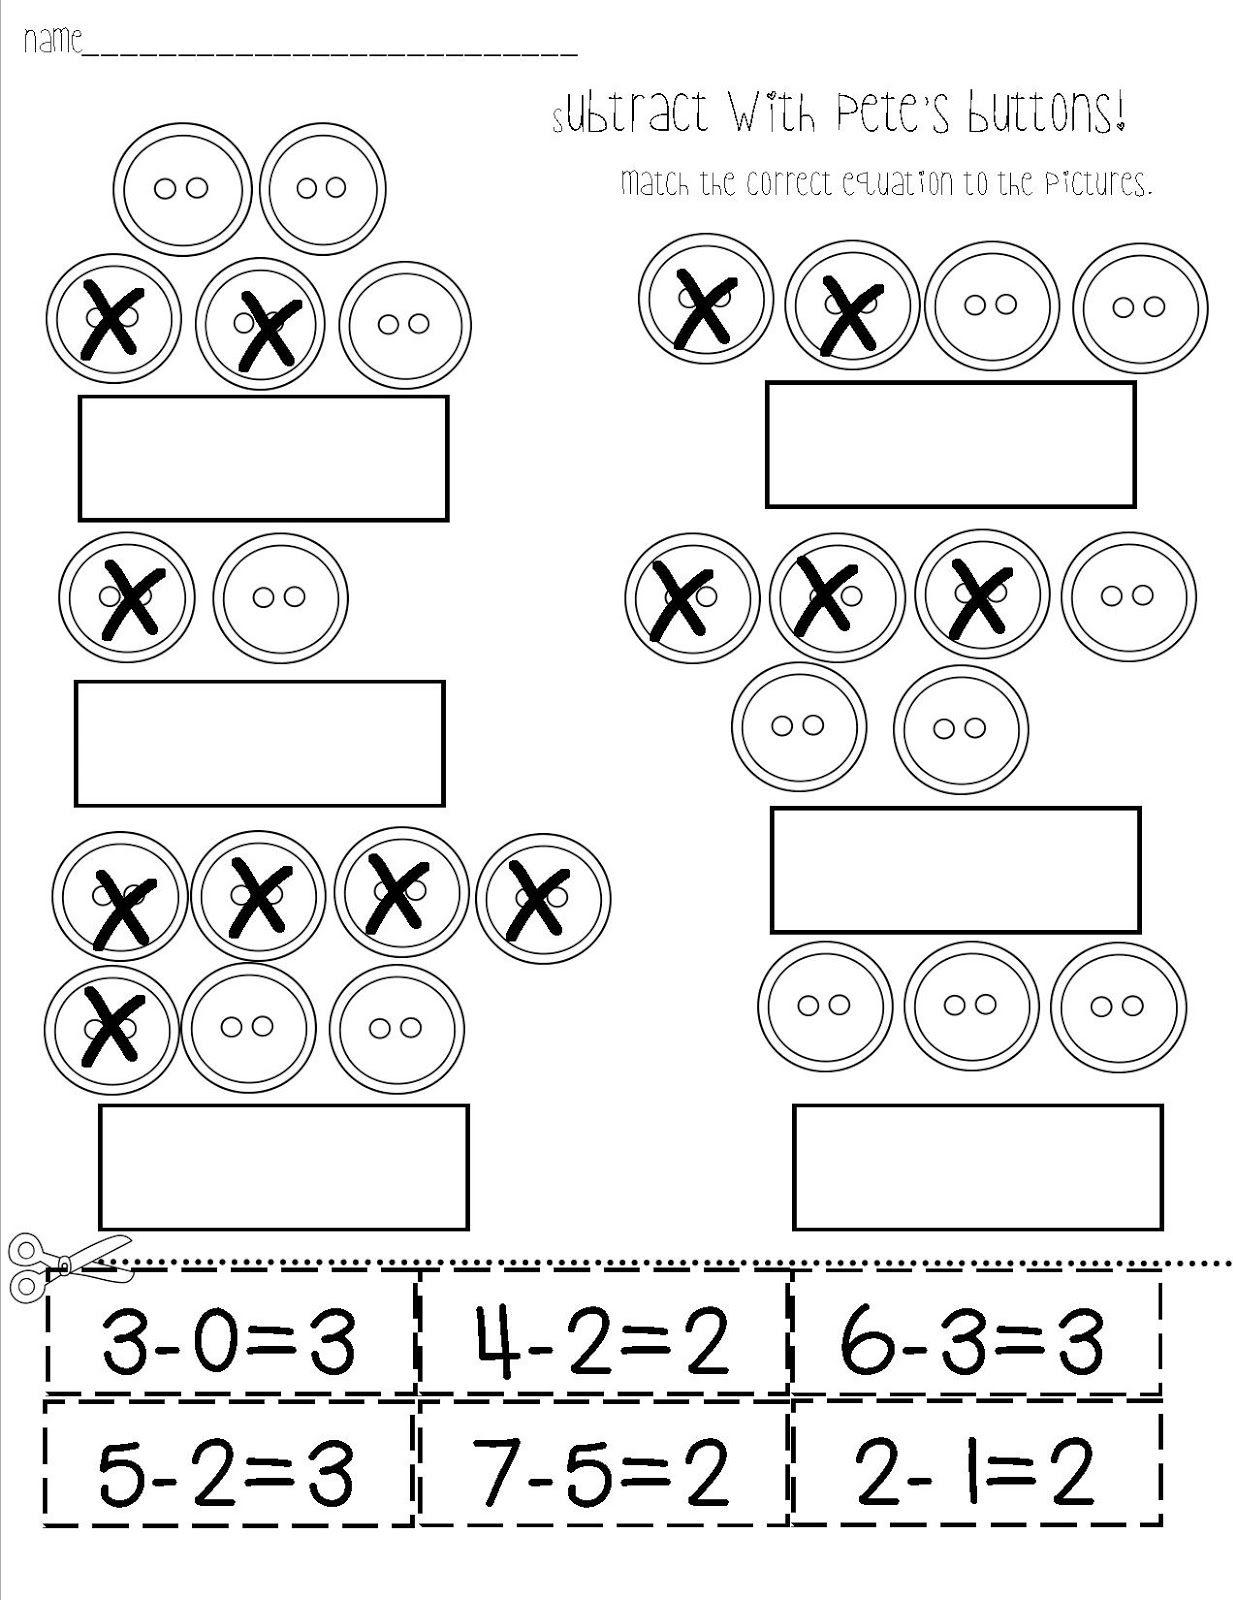 Mrs Bohatys Kindergarten Kingdom great subtraction worksheets – Free Kindergarten Subtraction Worksheets